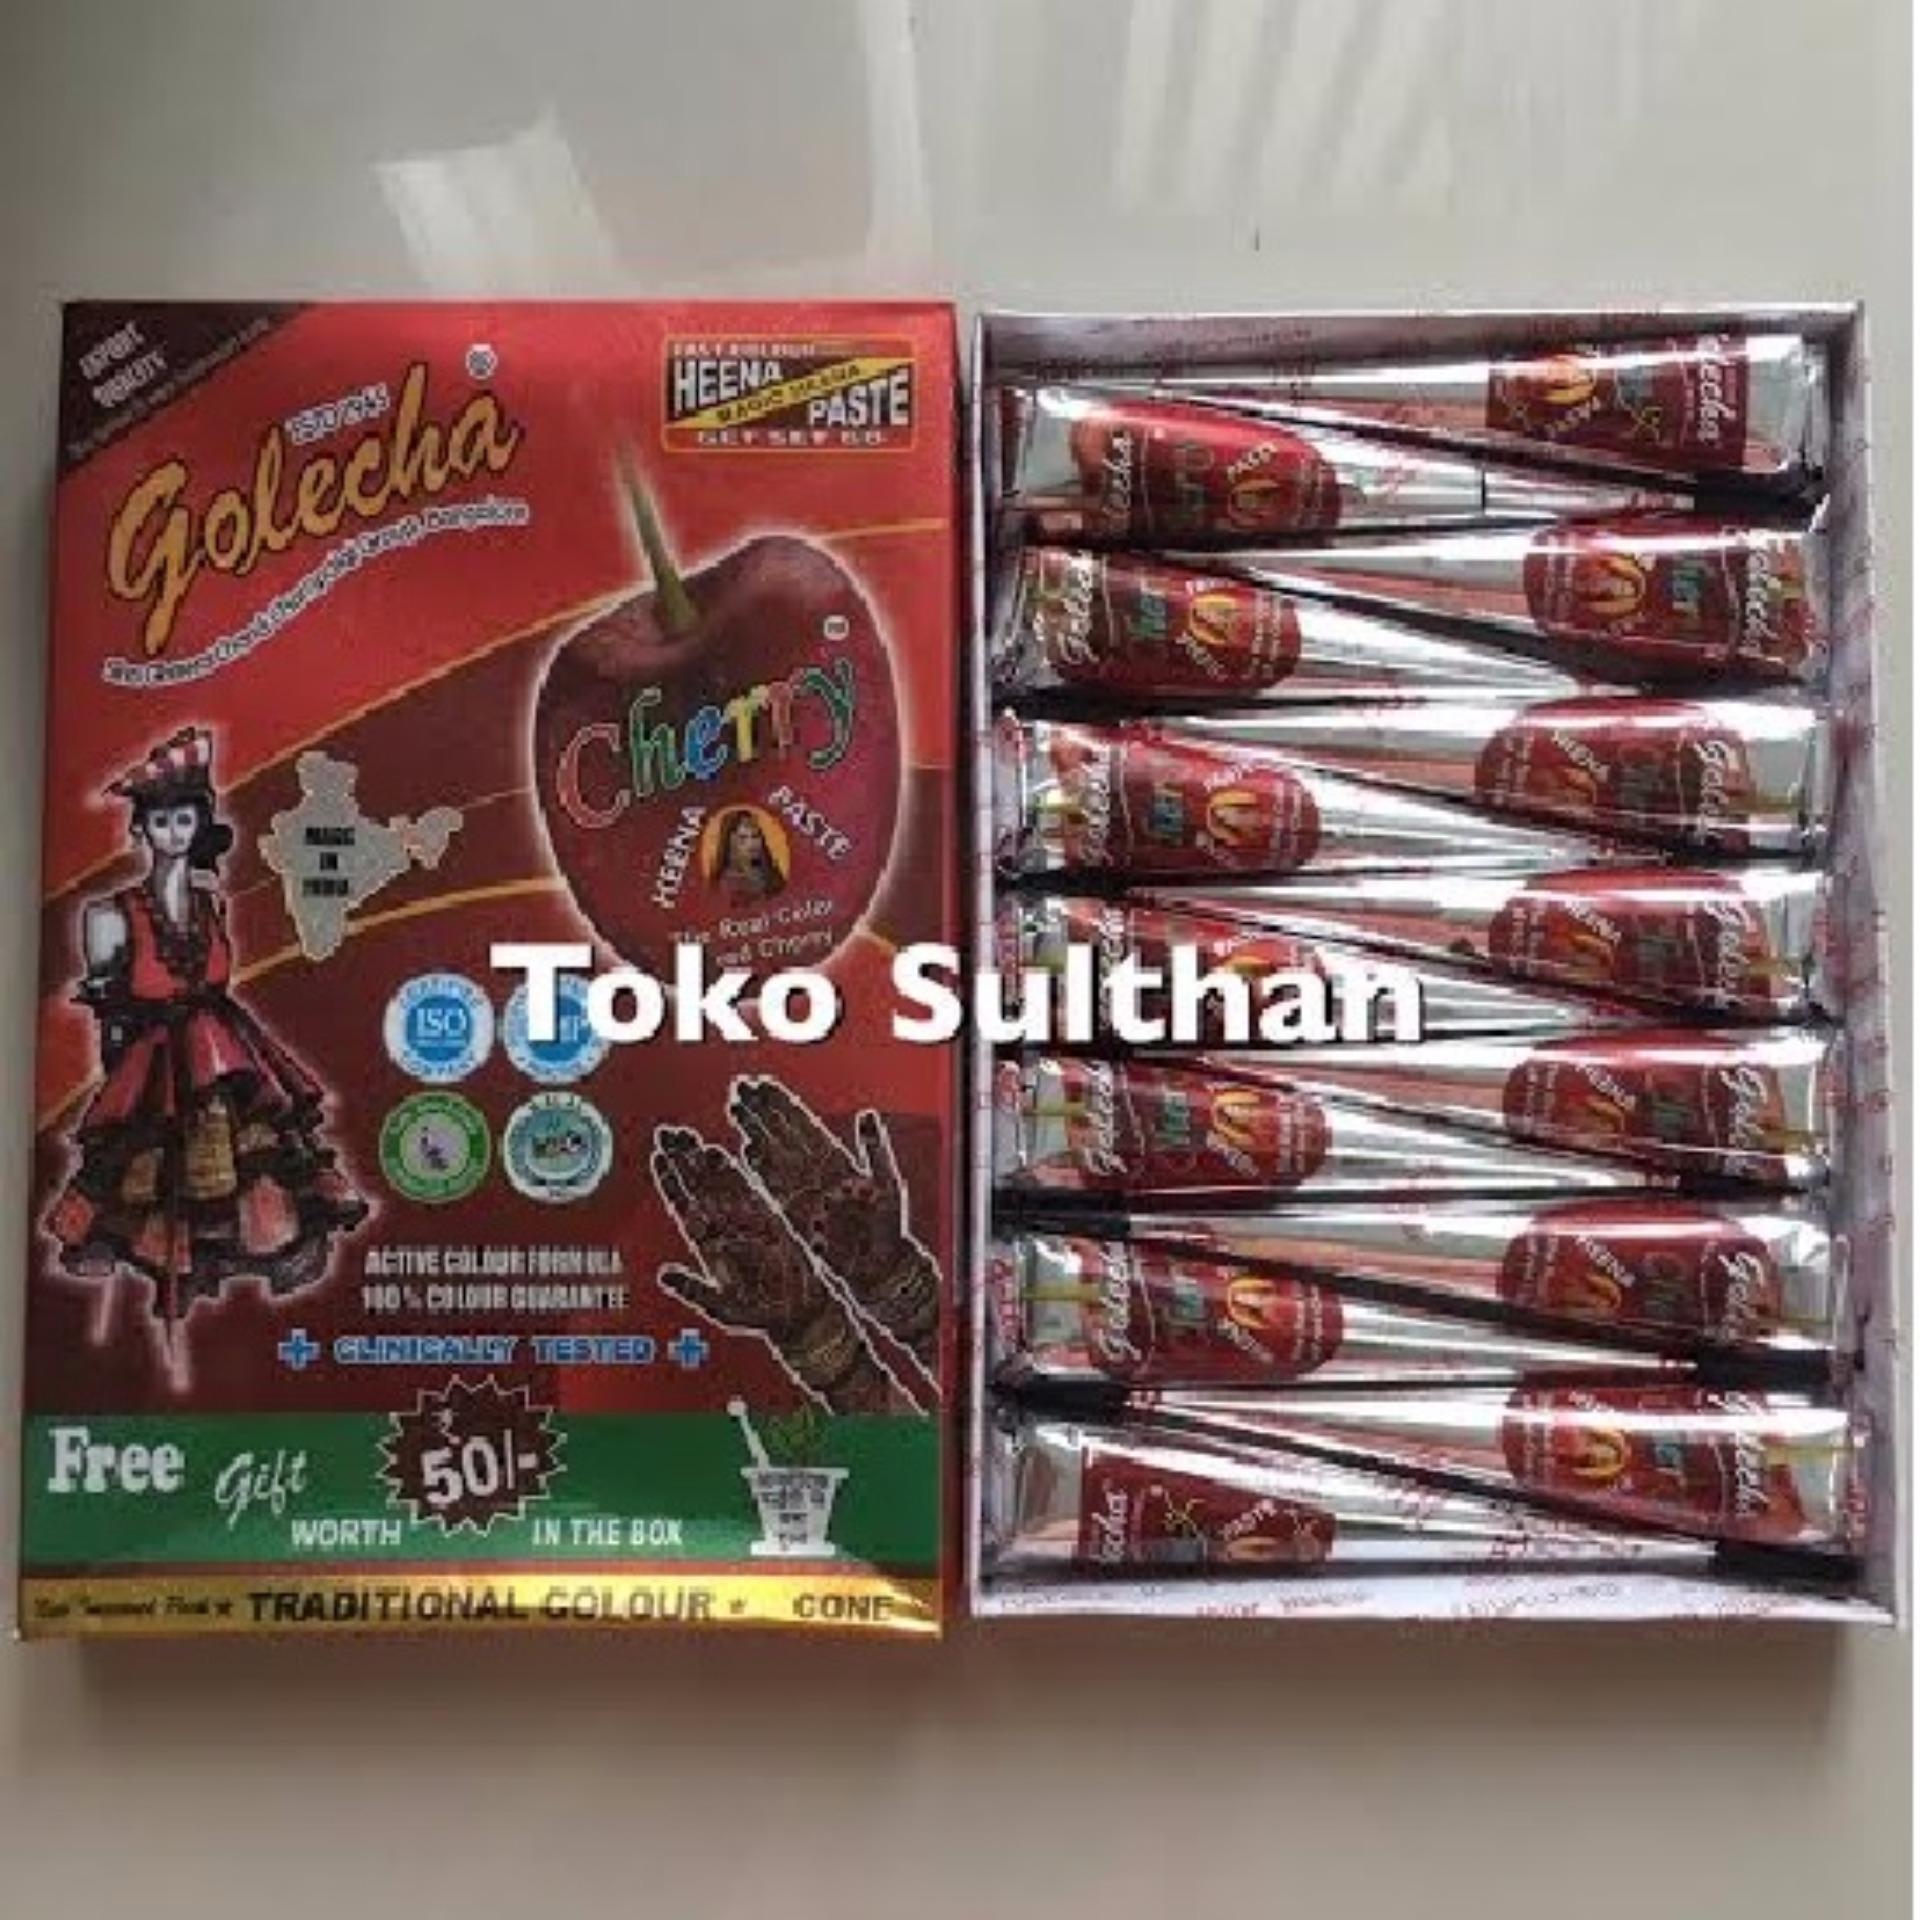 Pencarian Termurah Golecha Henna Cone Cherry Merah - 1box 12+2pcs sale - Hanya Rp42.975